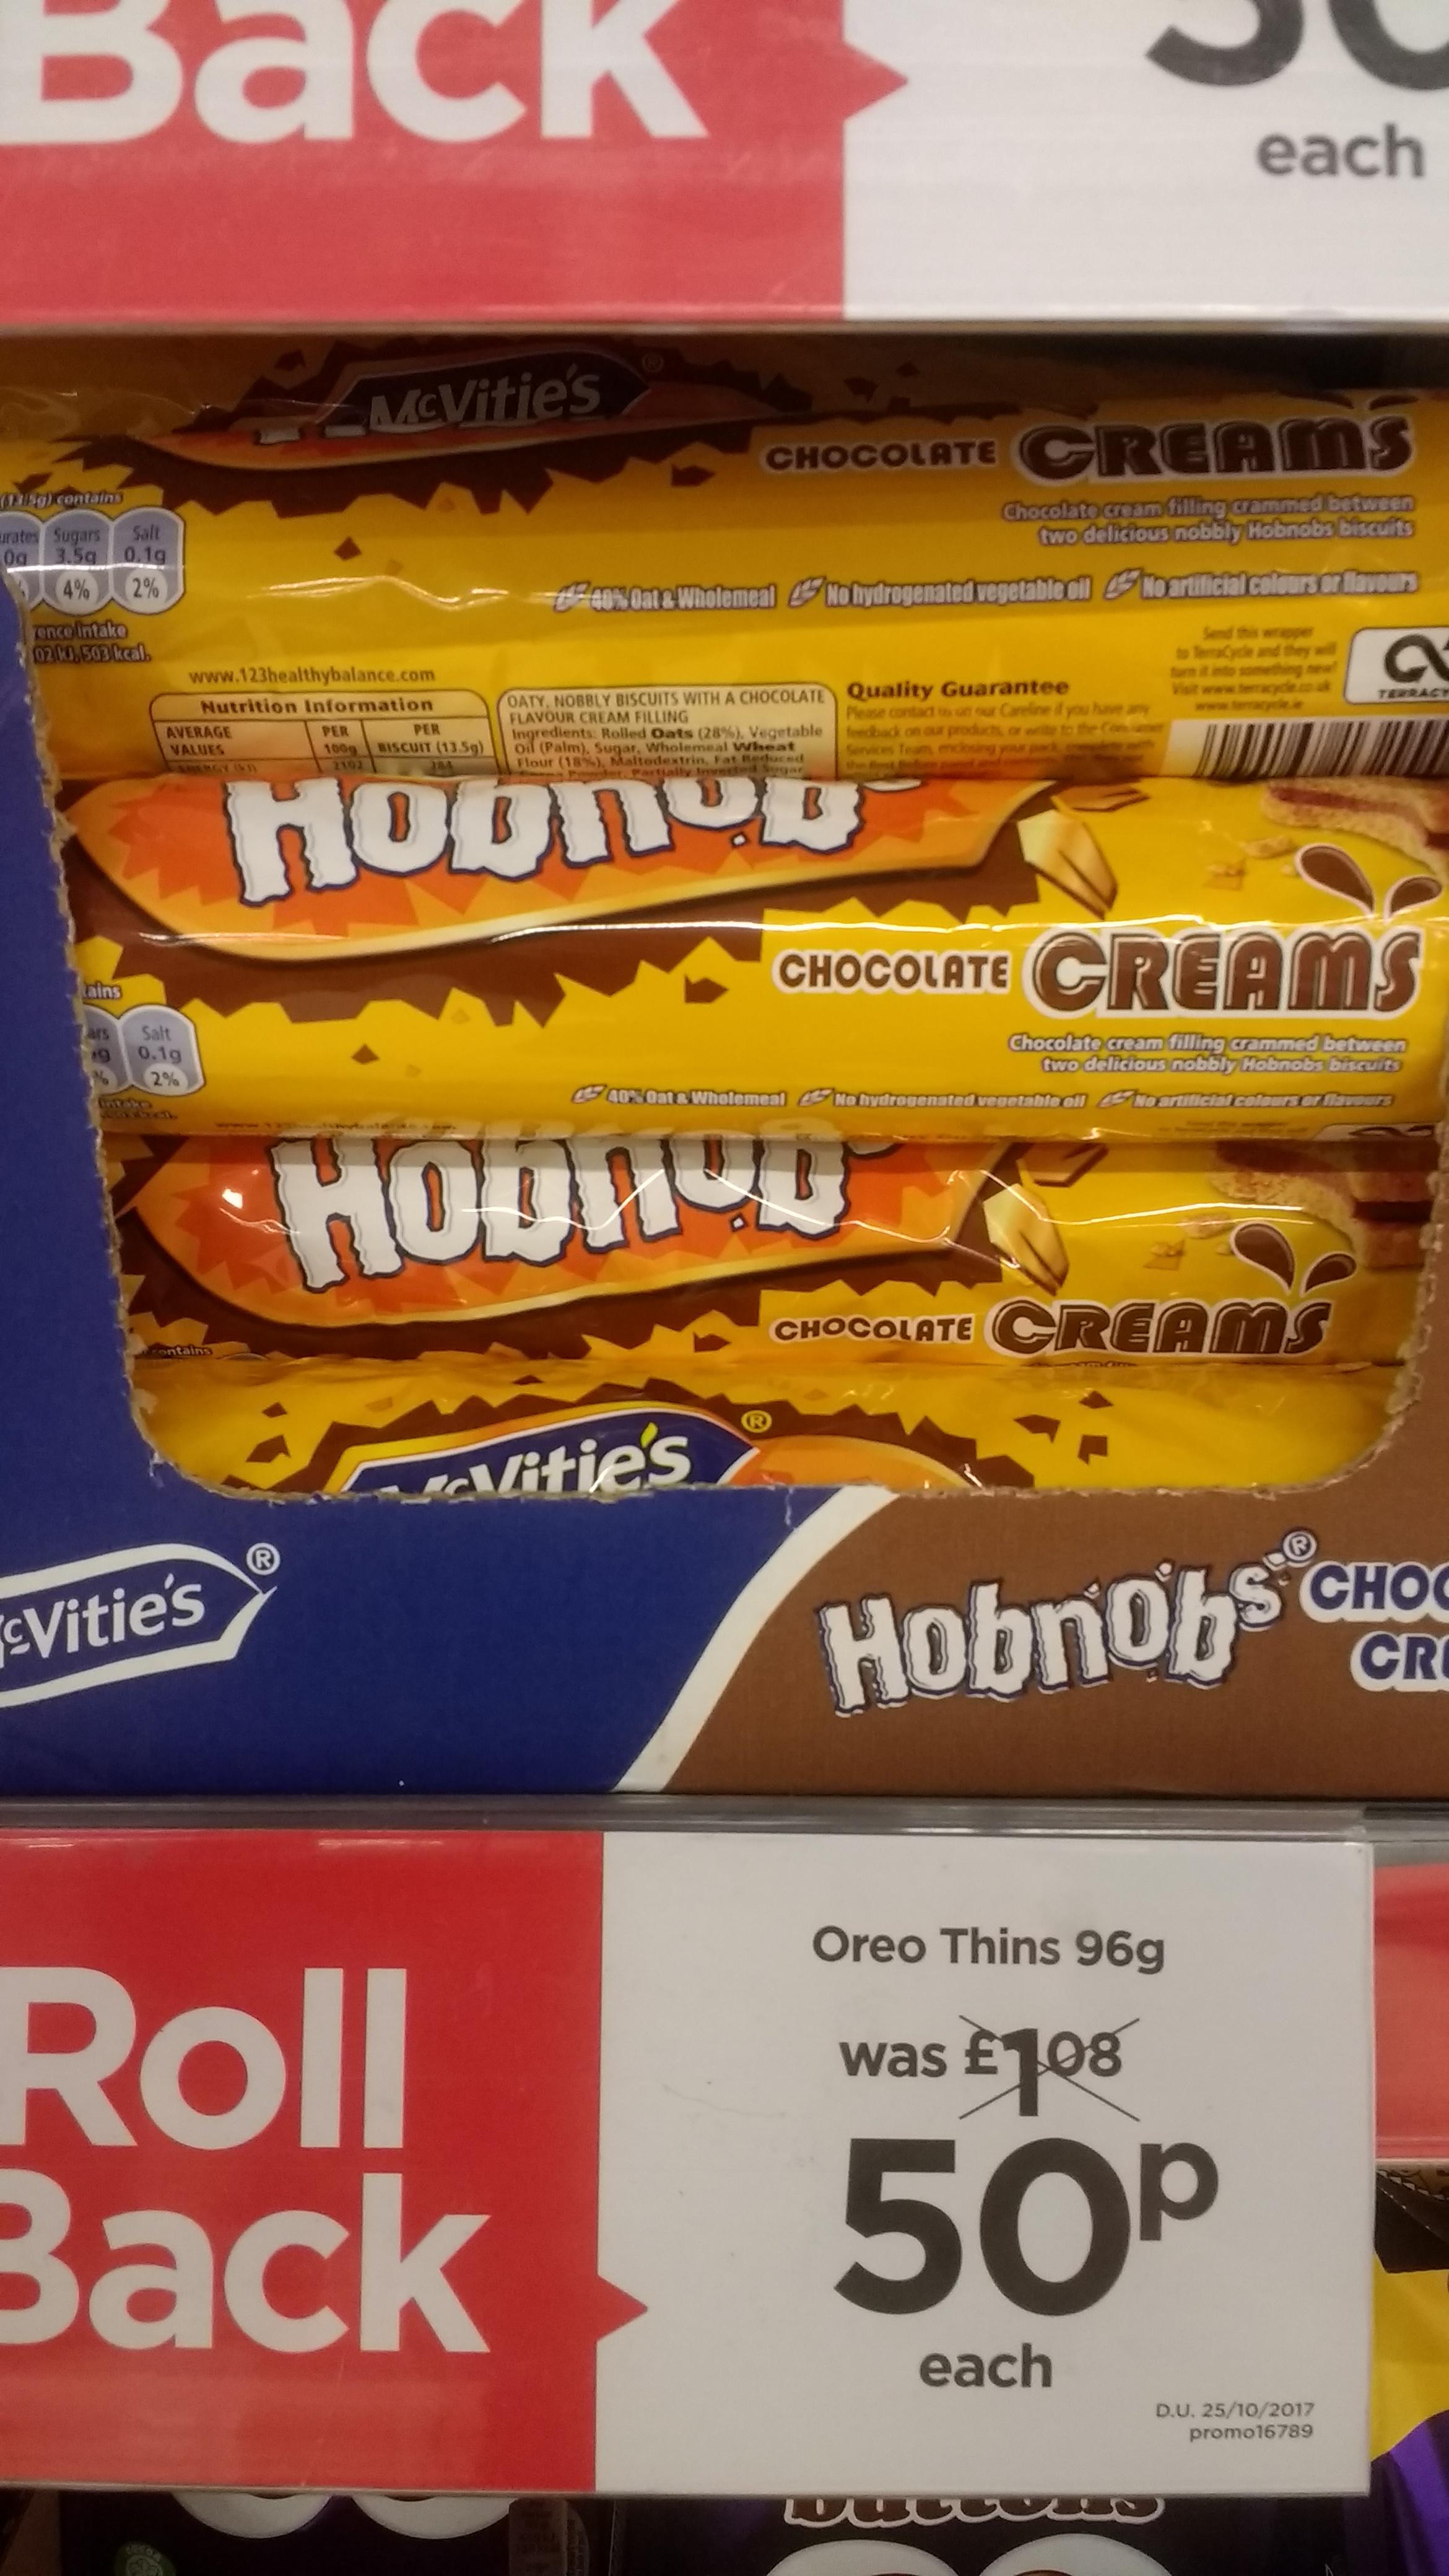 McVitie's Hobnobs Chocolate Cream Biscuits 200gr 50p @ Asda